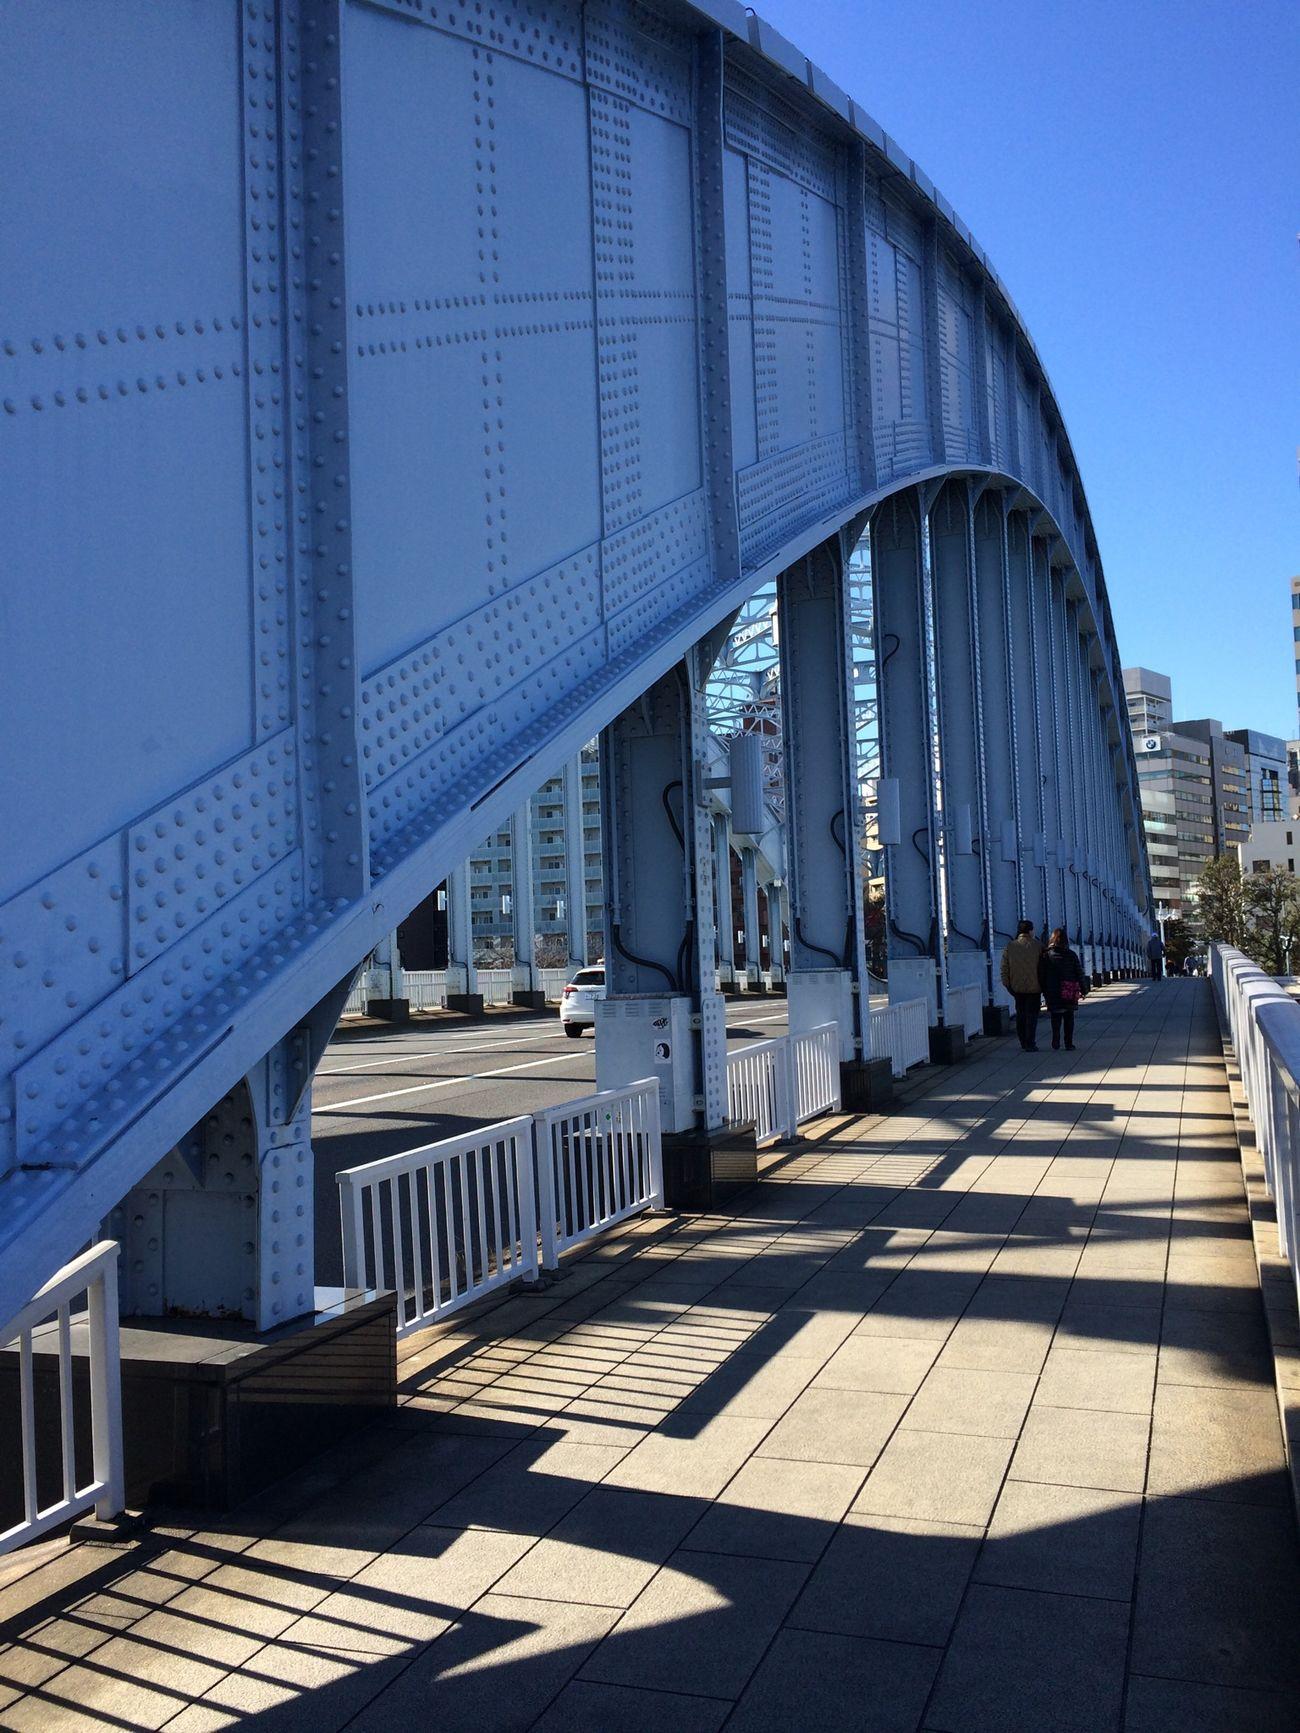 River Shillouette Civil Engineer Blue Sky